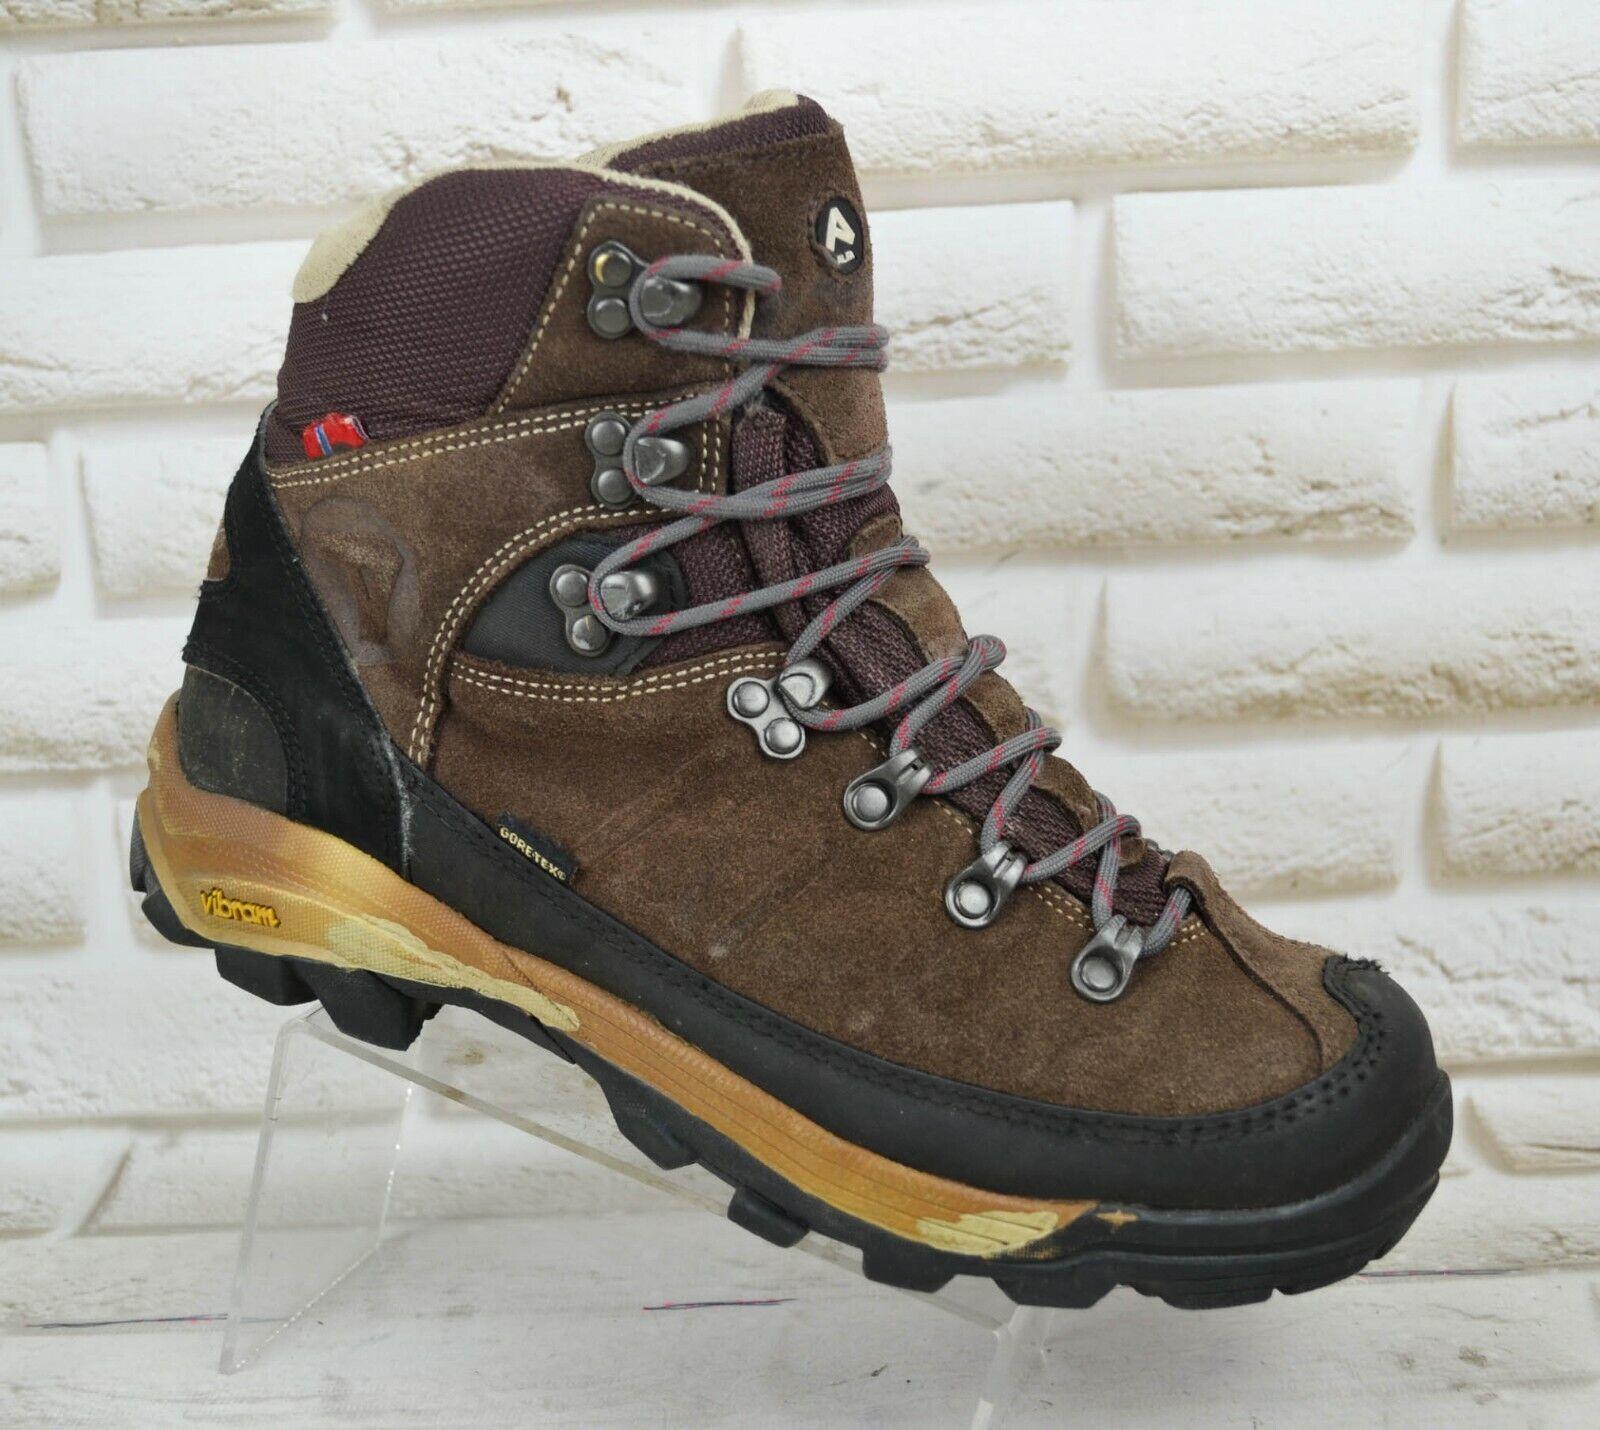 ALFA VIDDA GT damen Leather Hiking Outdoor Waterproof Stiefel Größe 7 UK 40 EU